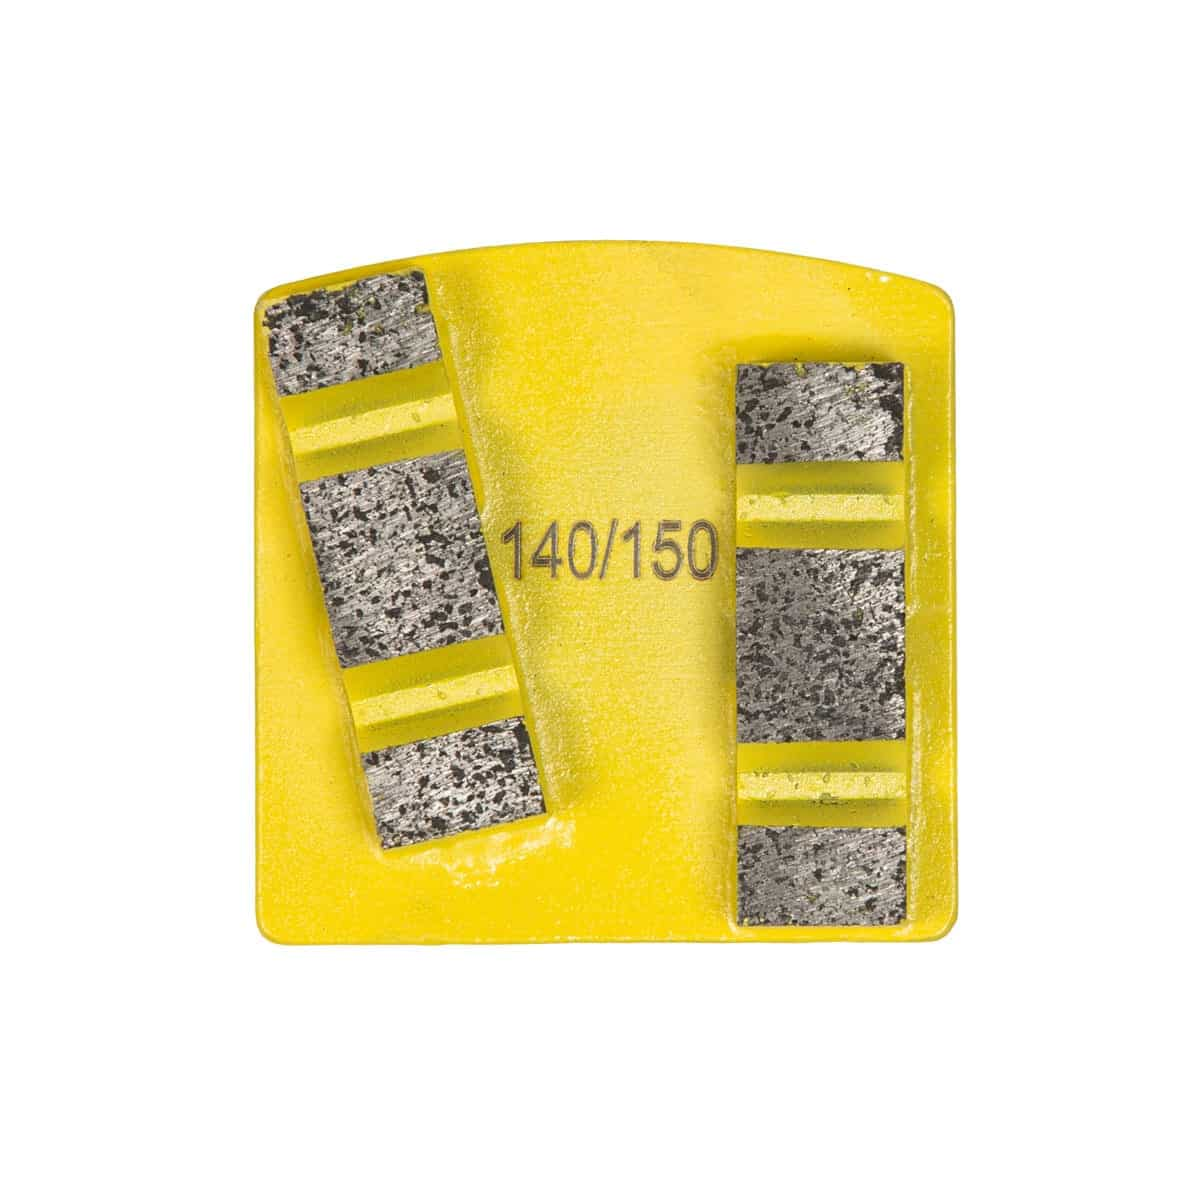 Scanmaskin World Series Diamond 12mm Double Yellow Super Soft Concrete Grinding Tool